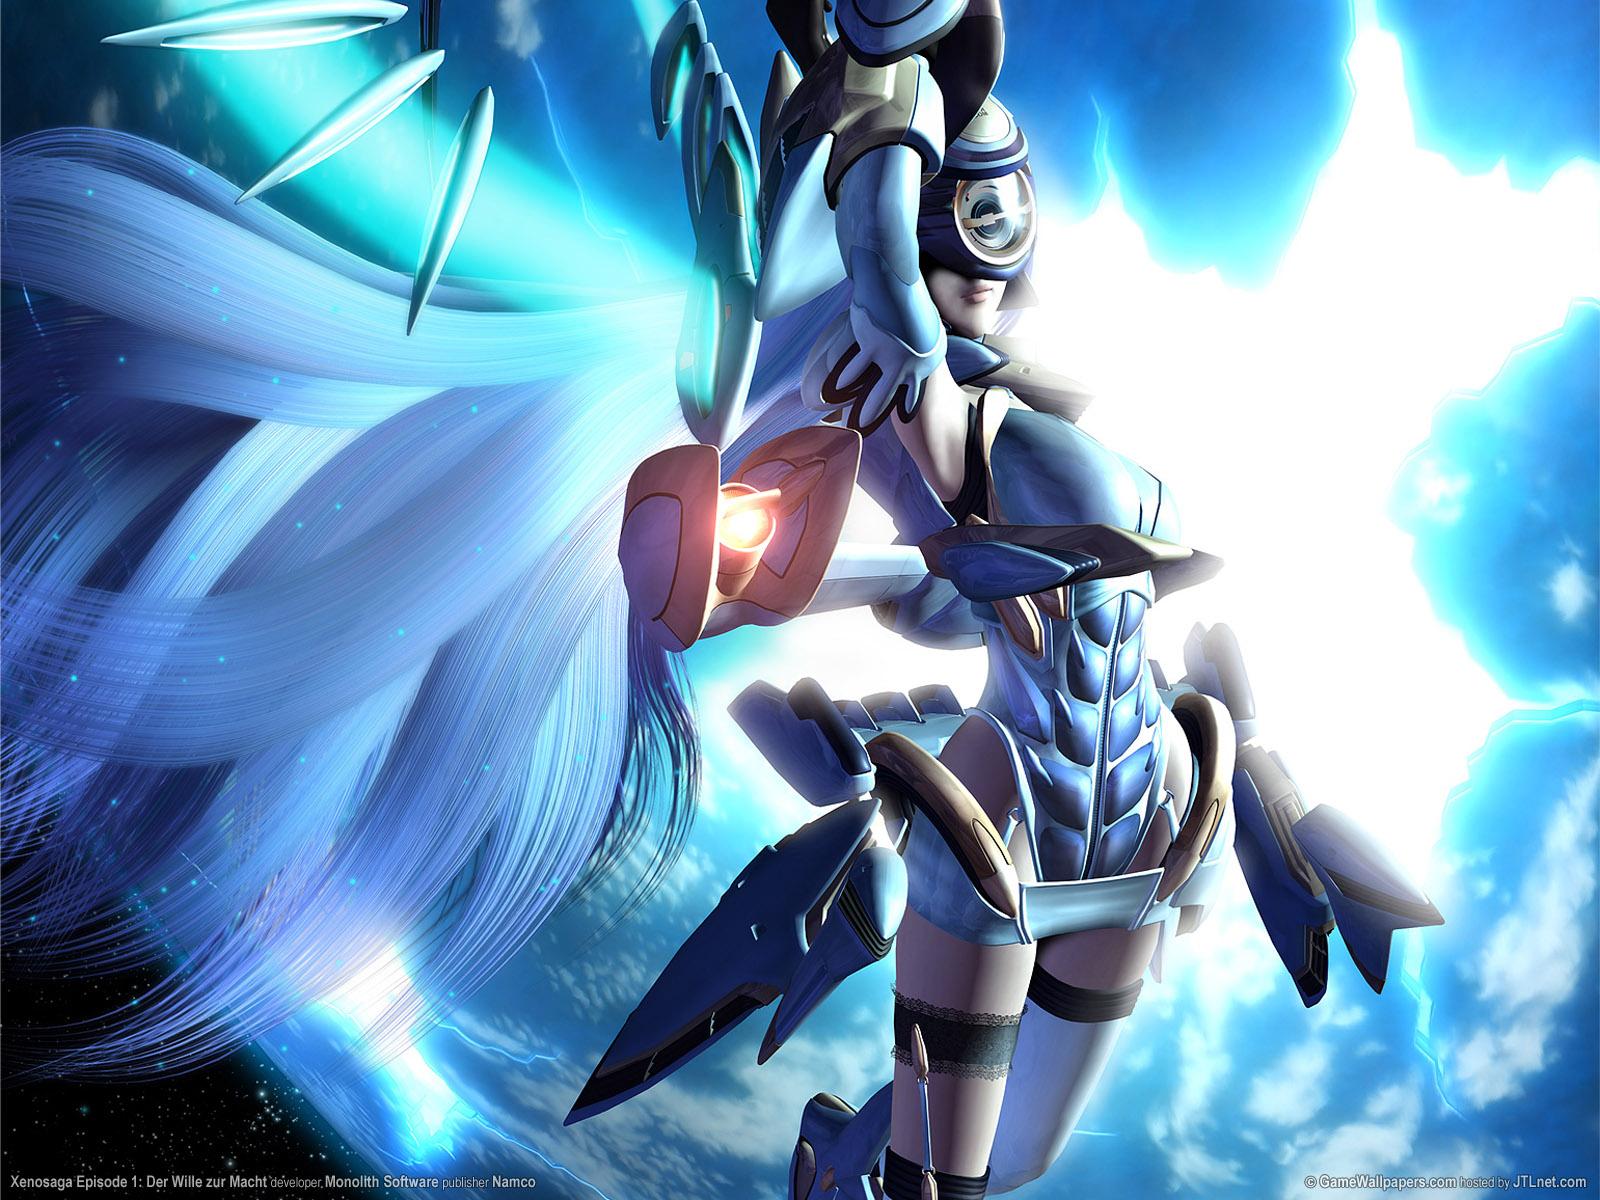 <img:http://jeuxvideosduweb.free.fr/data/media/1/wallpaper_xenosaga_episode_1_der_wille_zur_macht_01_1600.jpg>